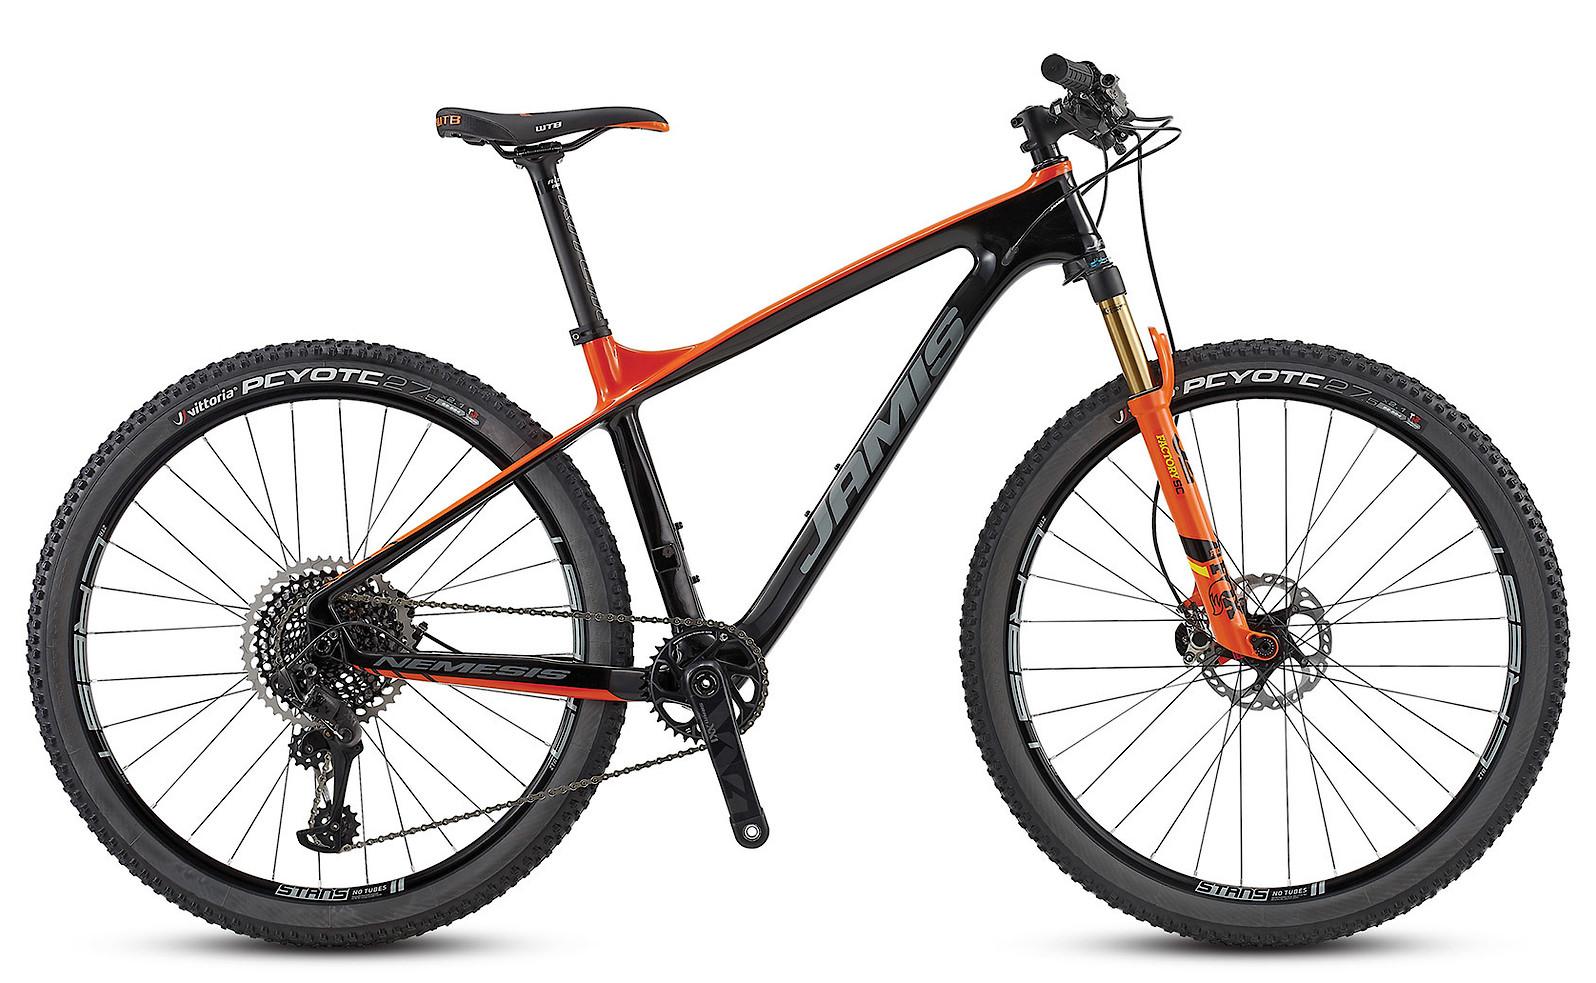 0ef32a8007 2019 Jamis Nemesis Team Bike - Reviews